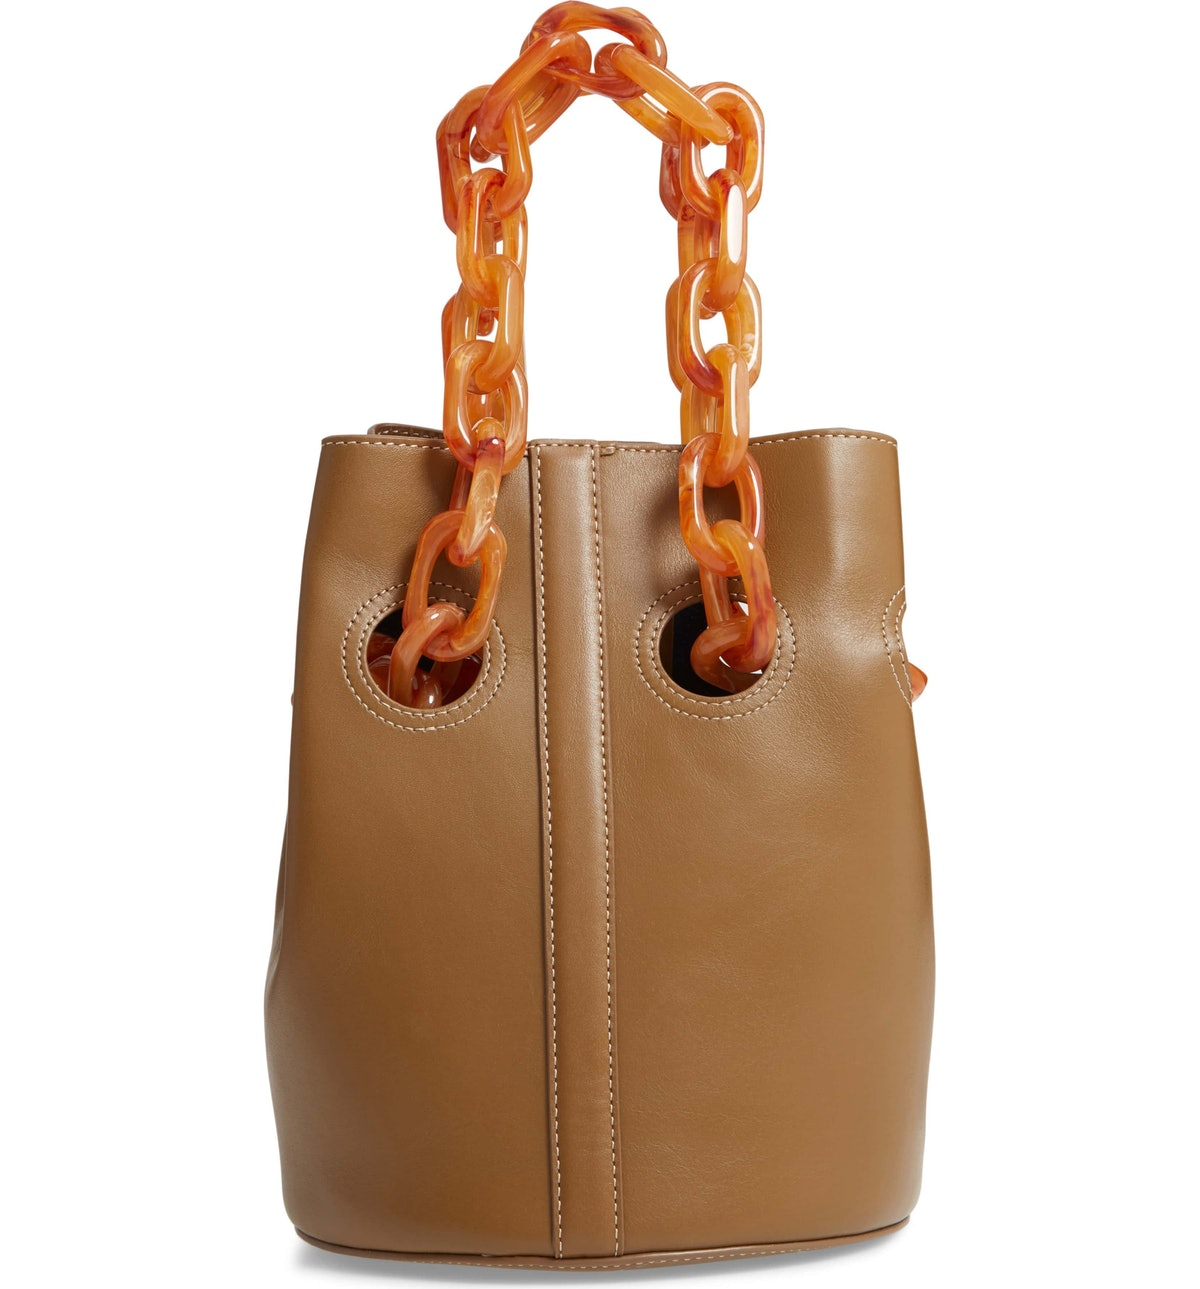 Goodall Leather Bucket Bag